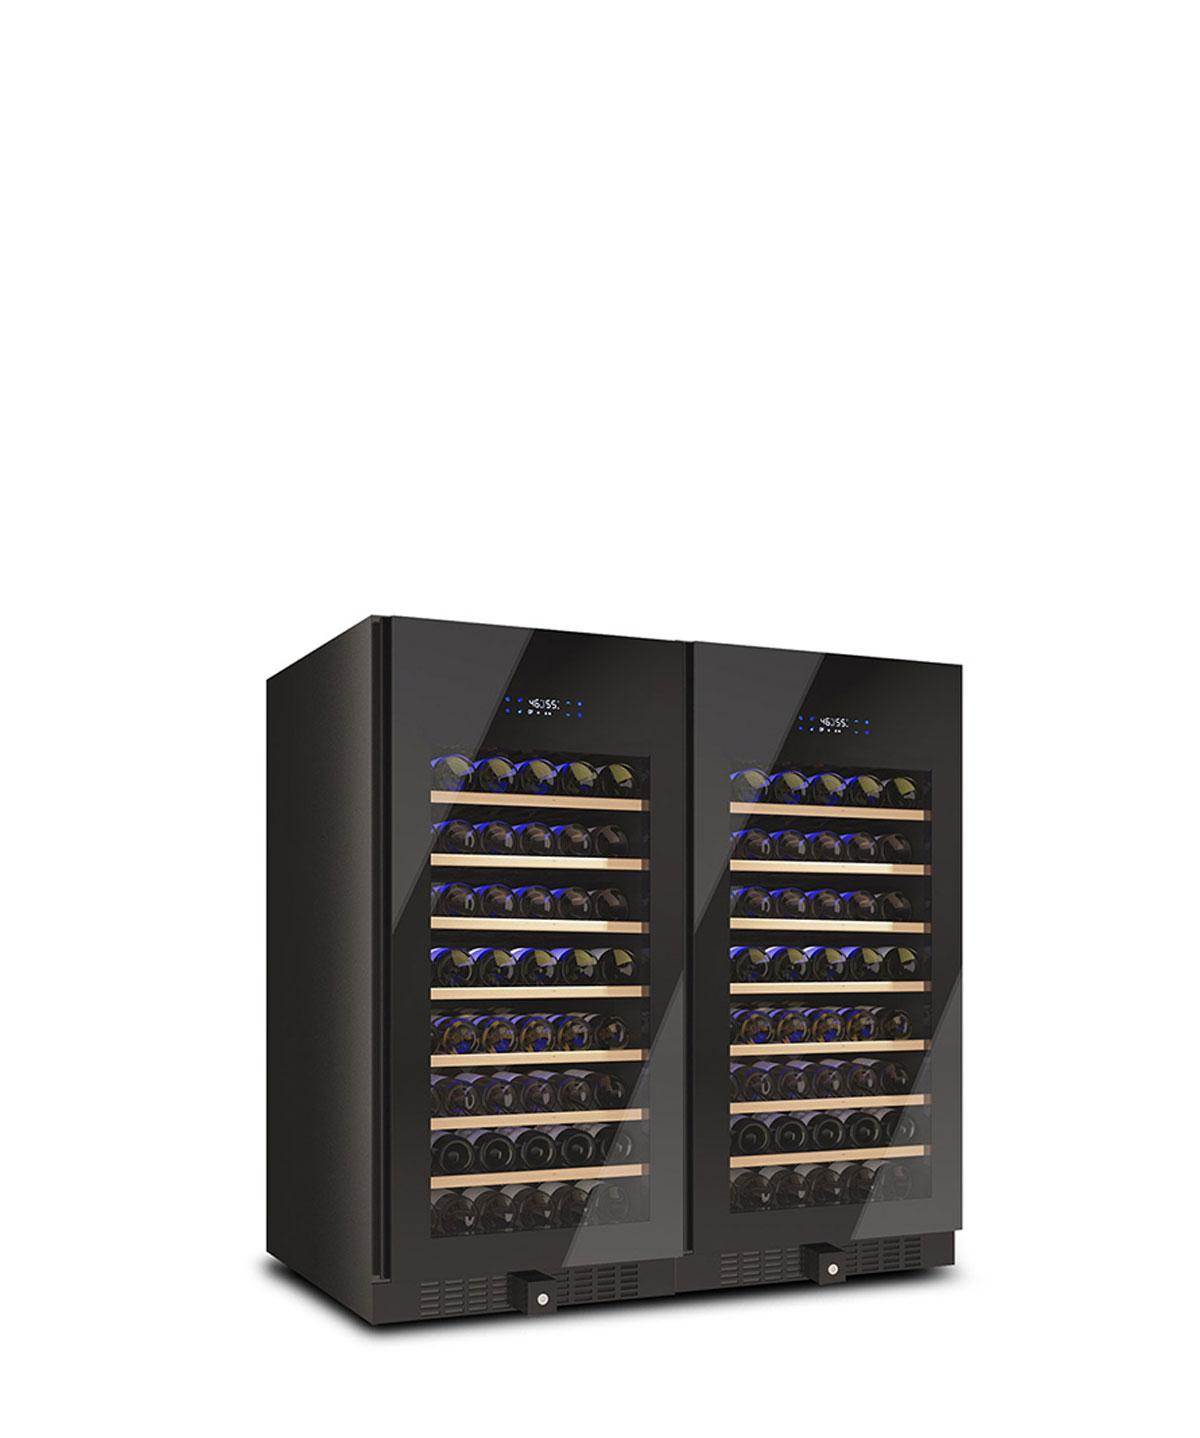 Armadio cantina linea Luxury 192 bottiglie Altamente Professionale